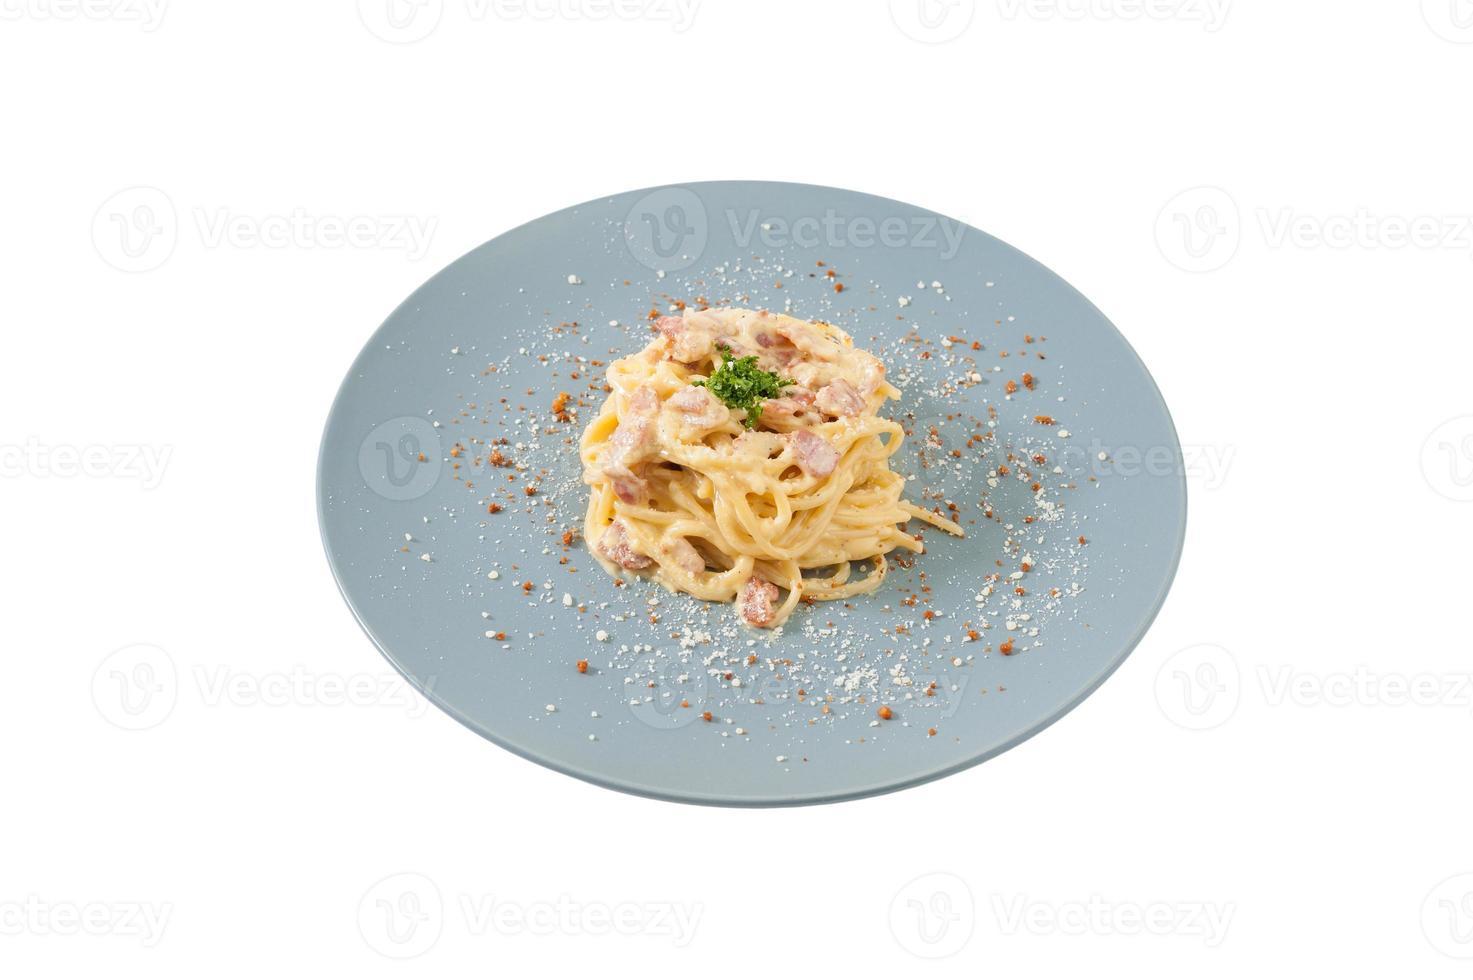 pâtes sauce blanche photo